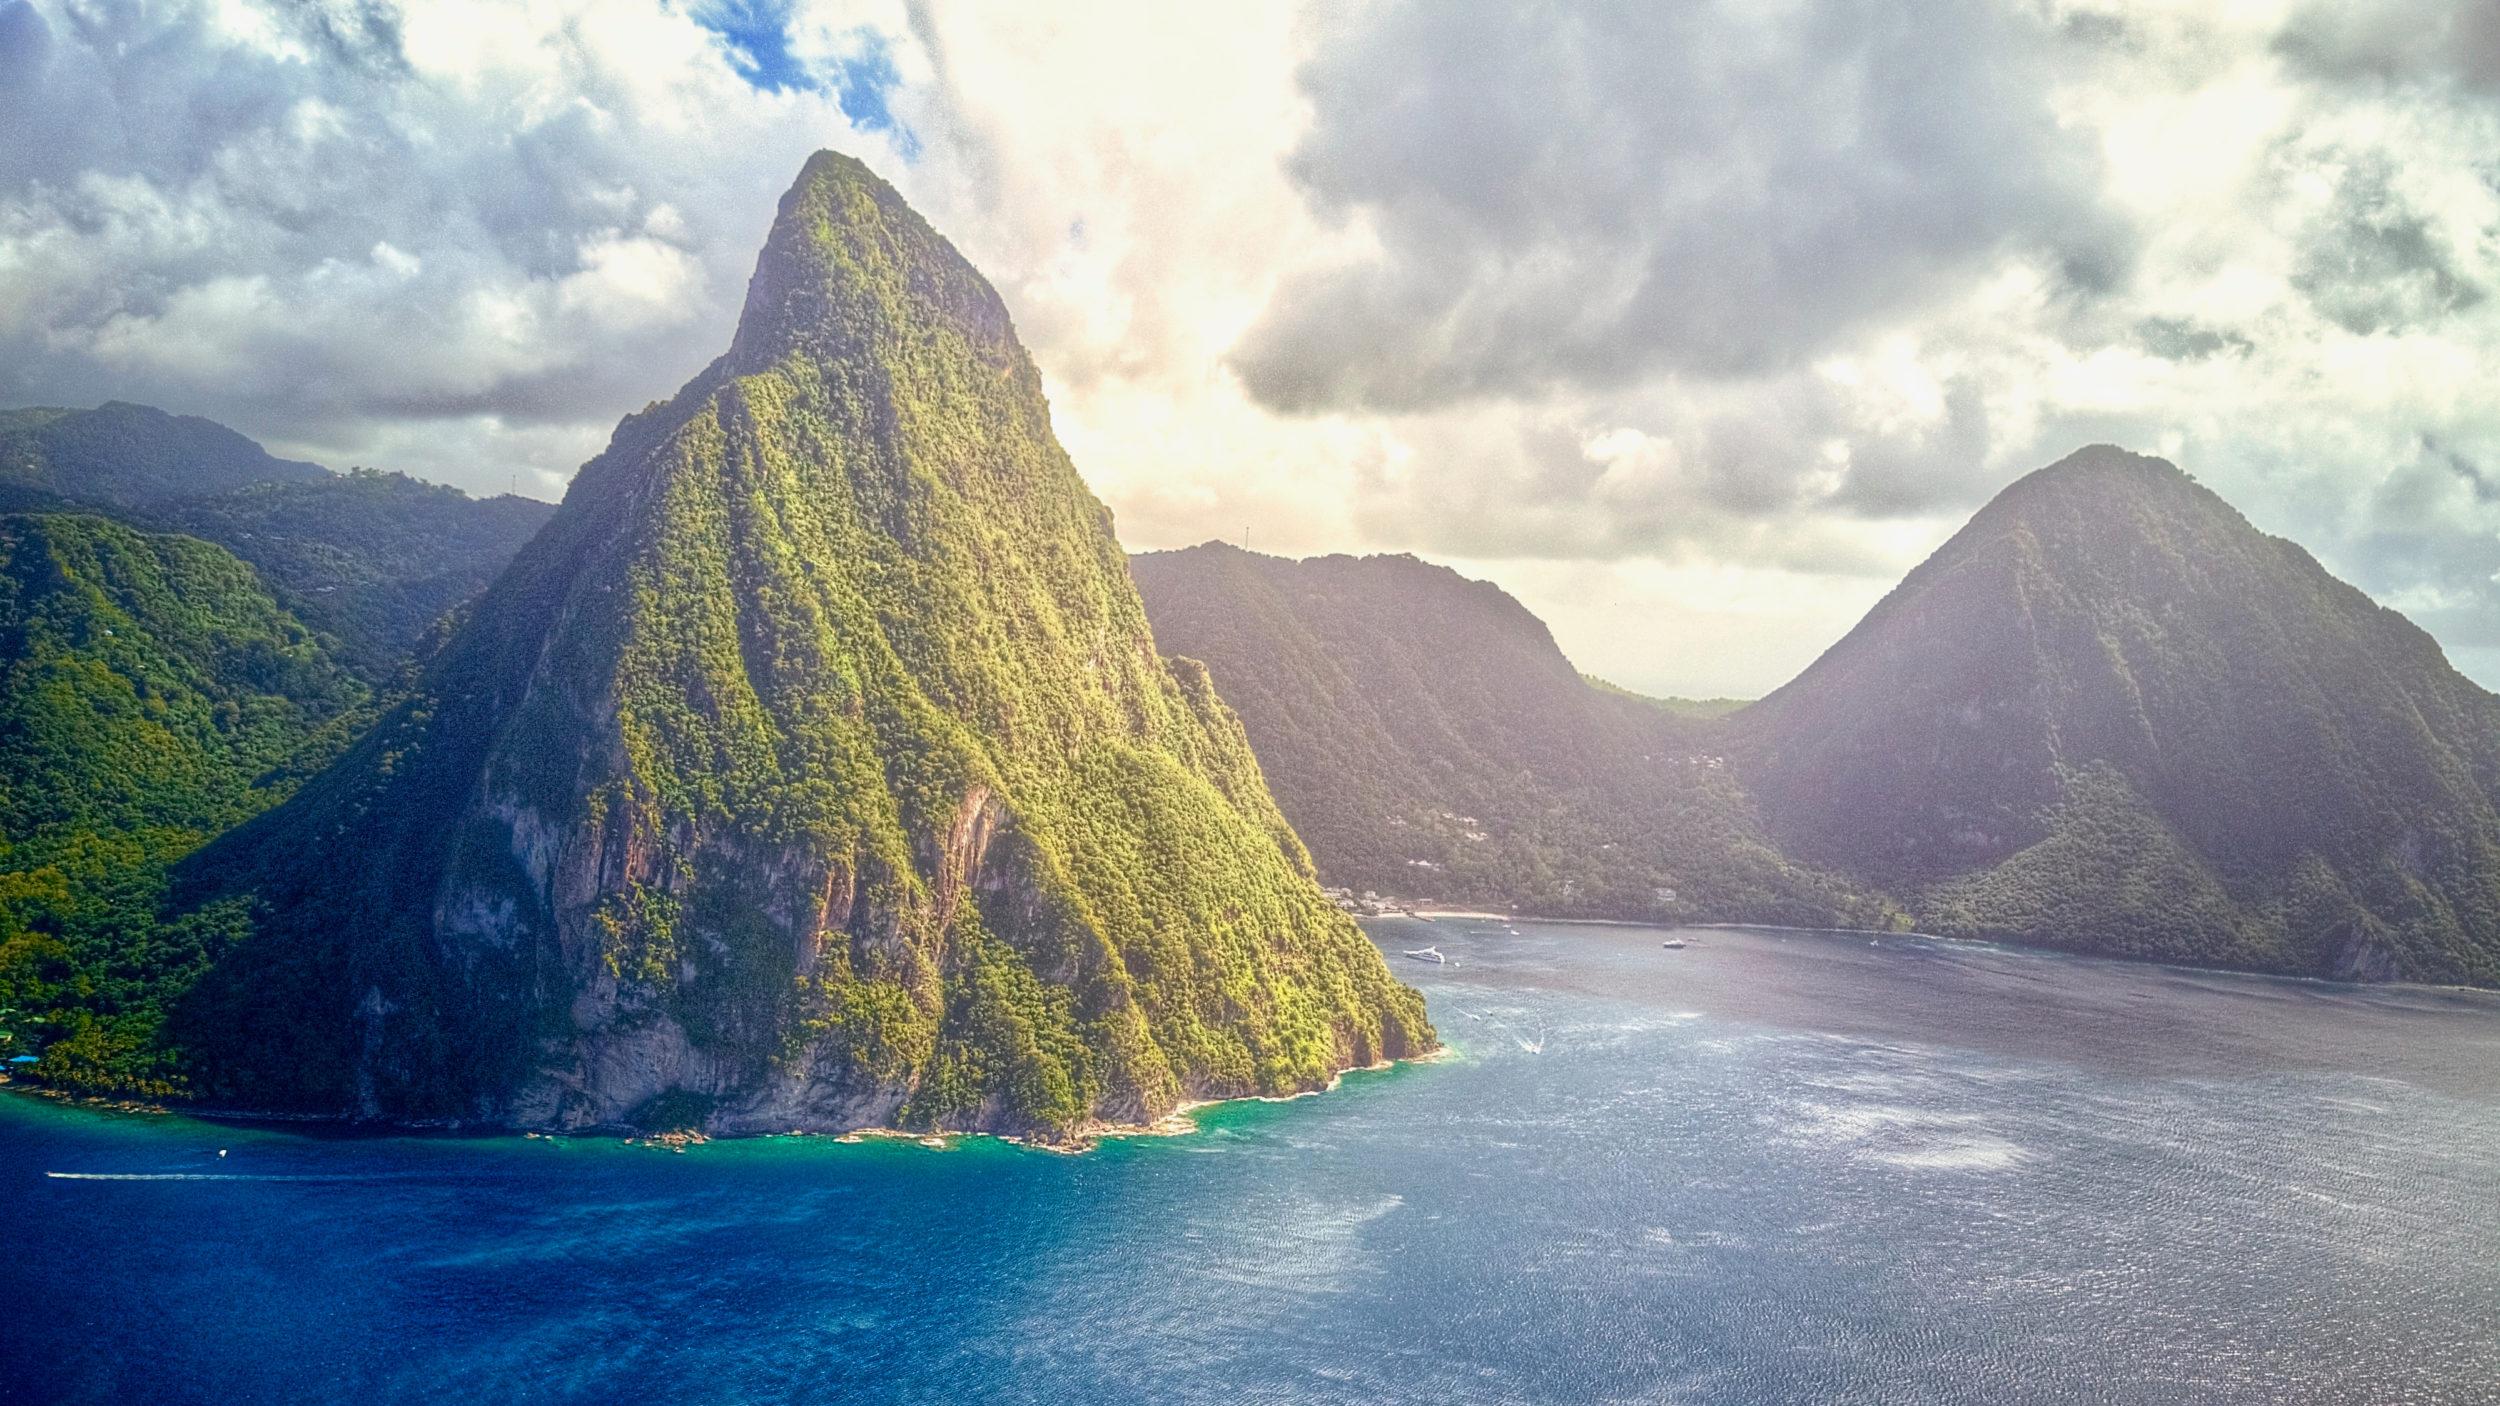 St. Lucia [Shutterstock]